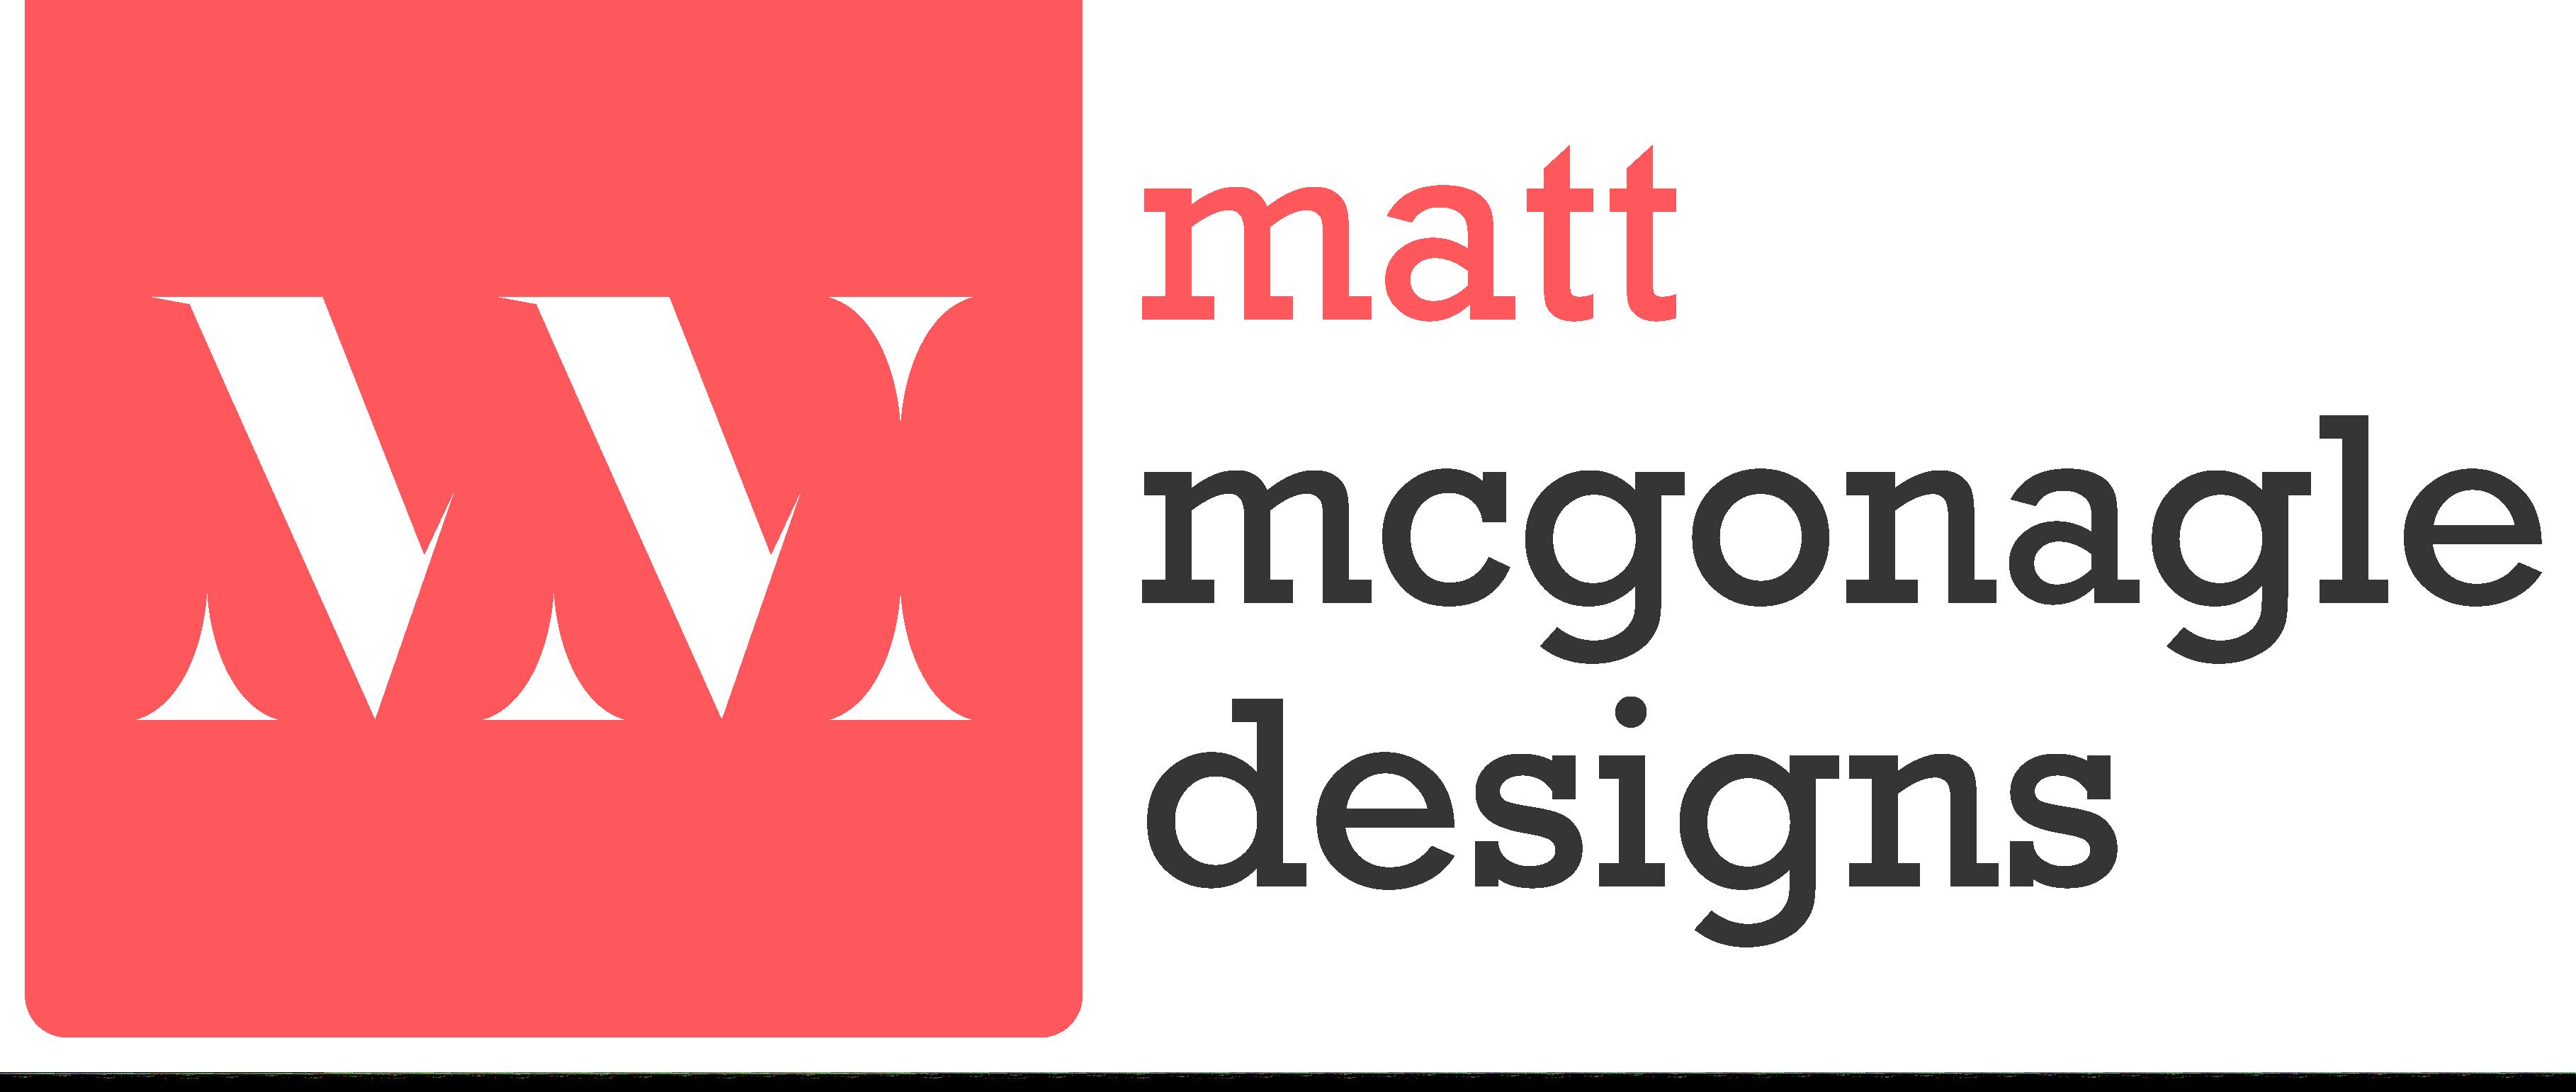 Matt McGonagle